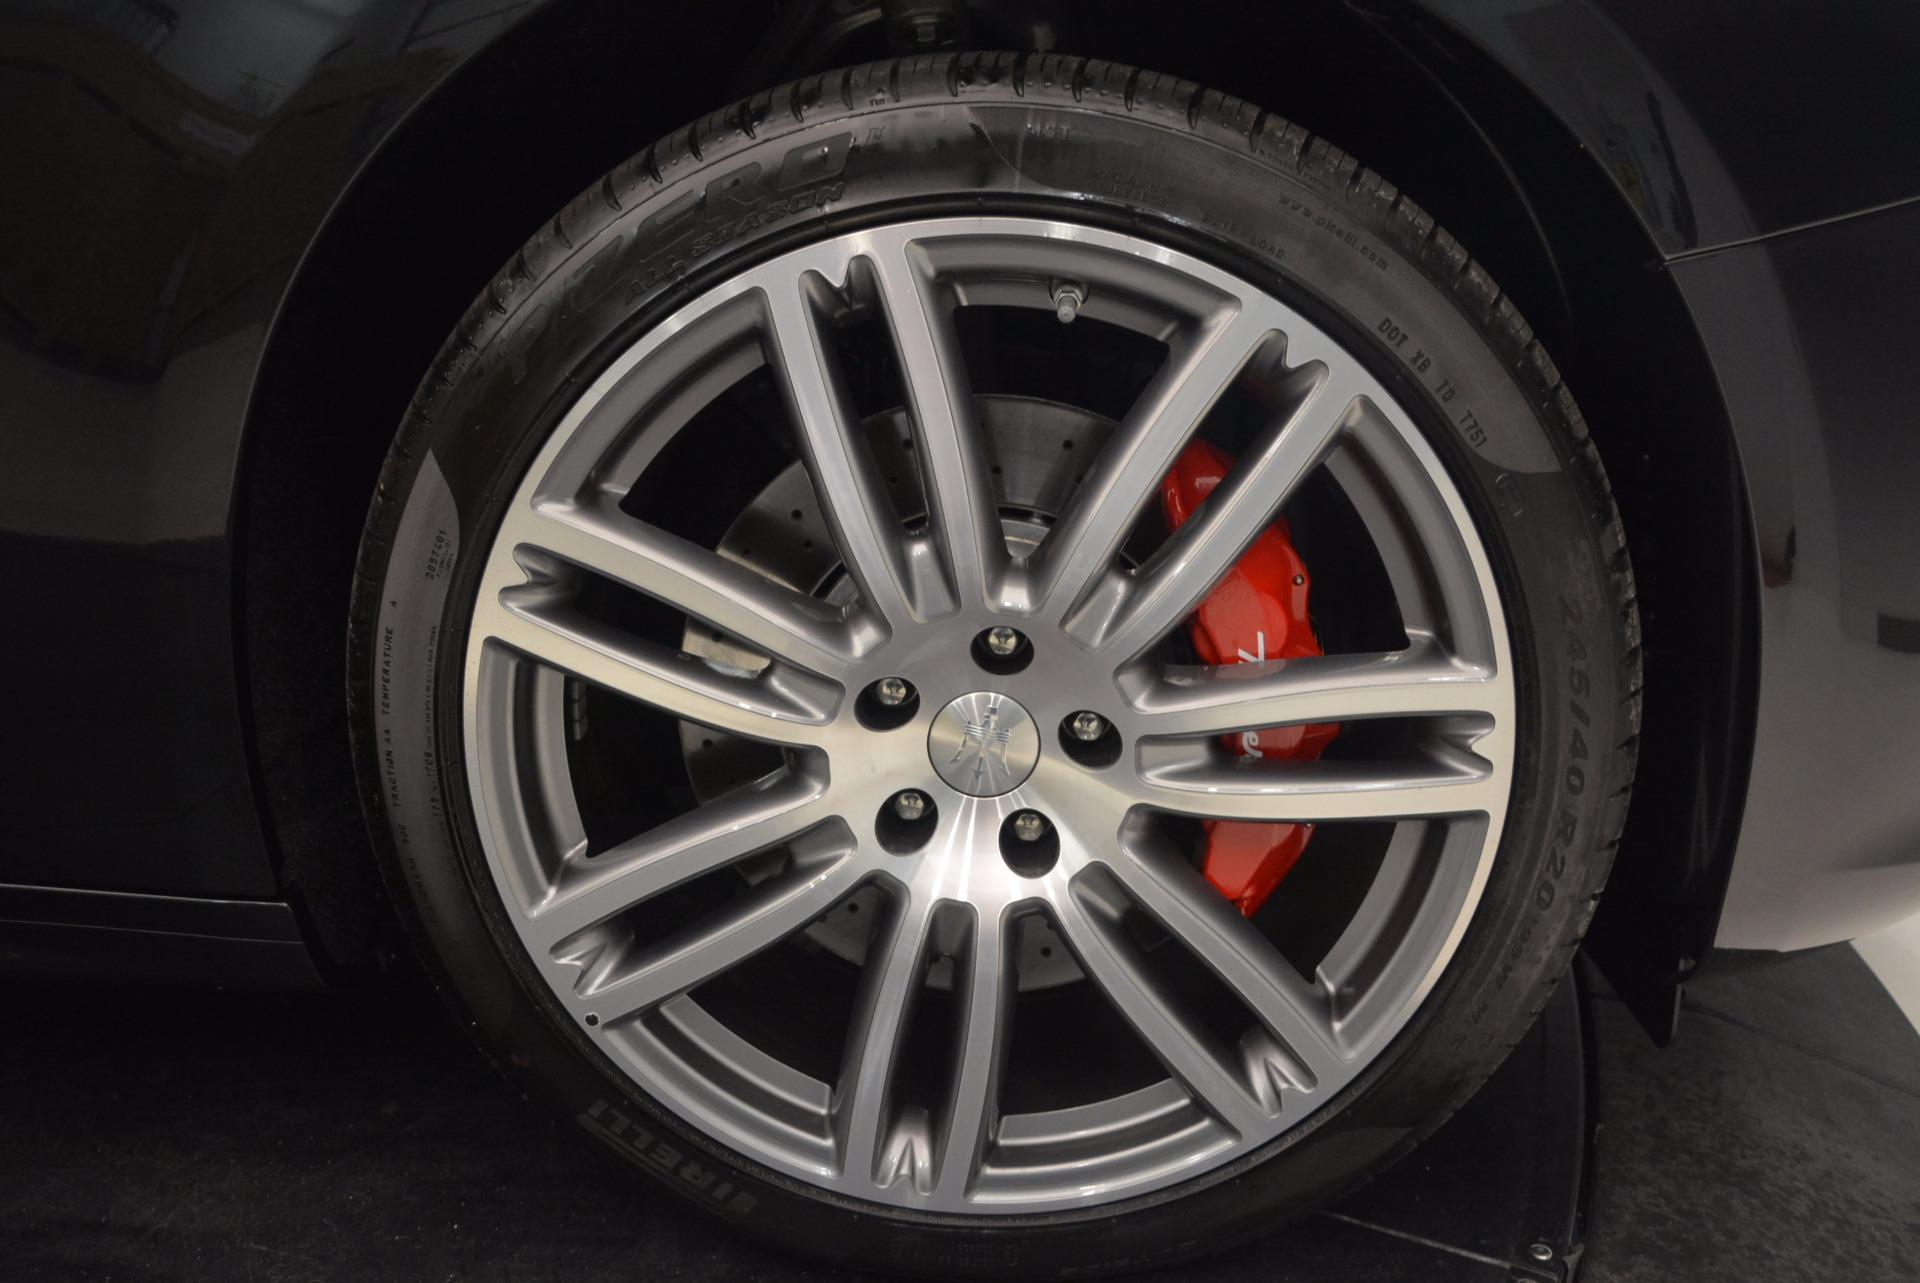 New 2018 Maserati Ghibli S Q4 Gransport For Sale In Greenwich, CT 1855_p25